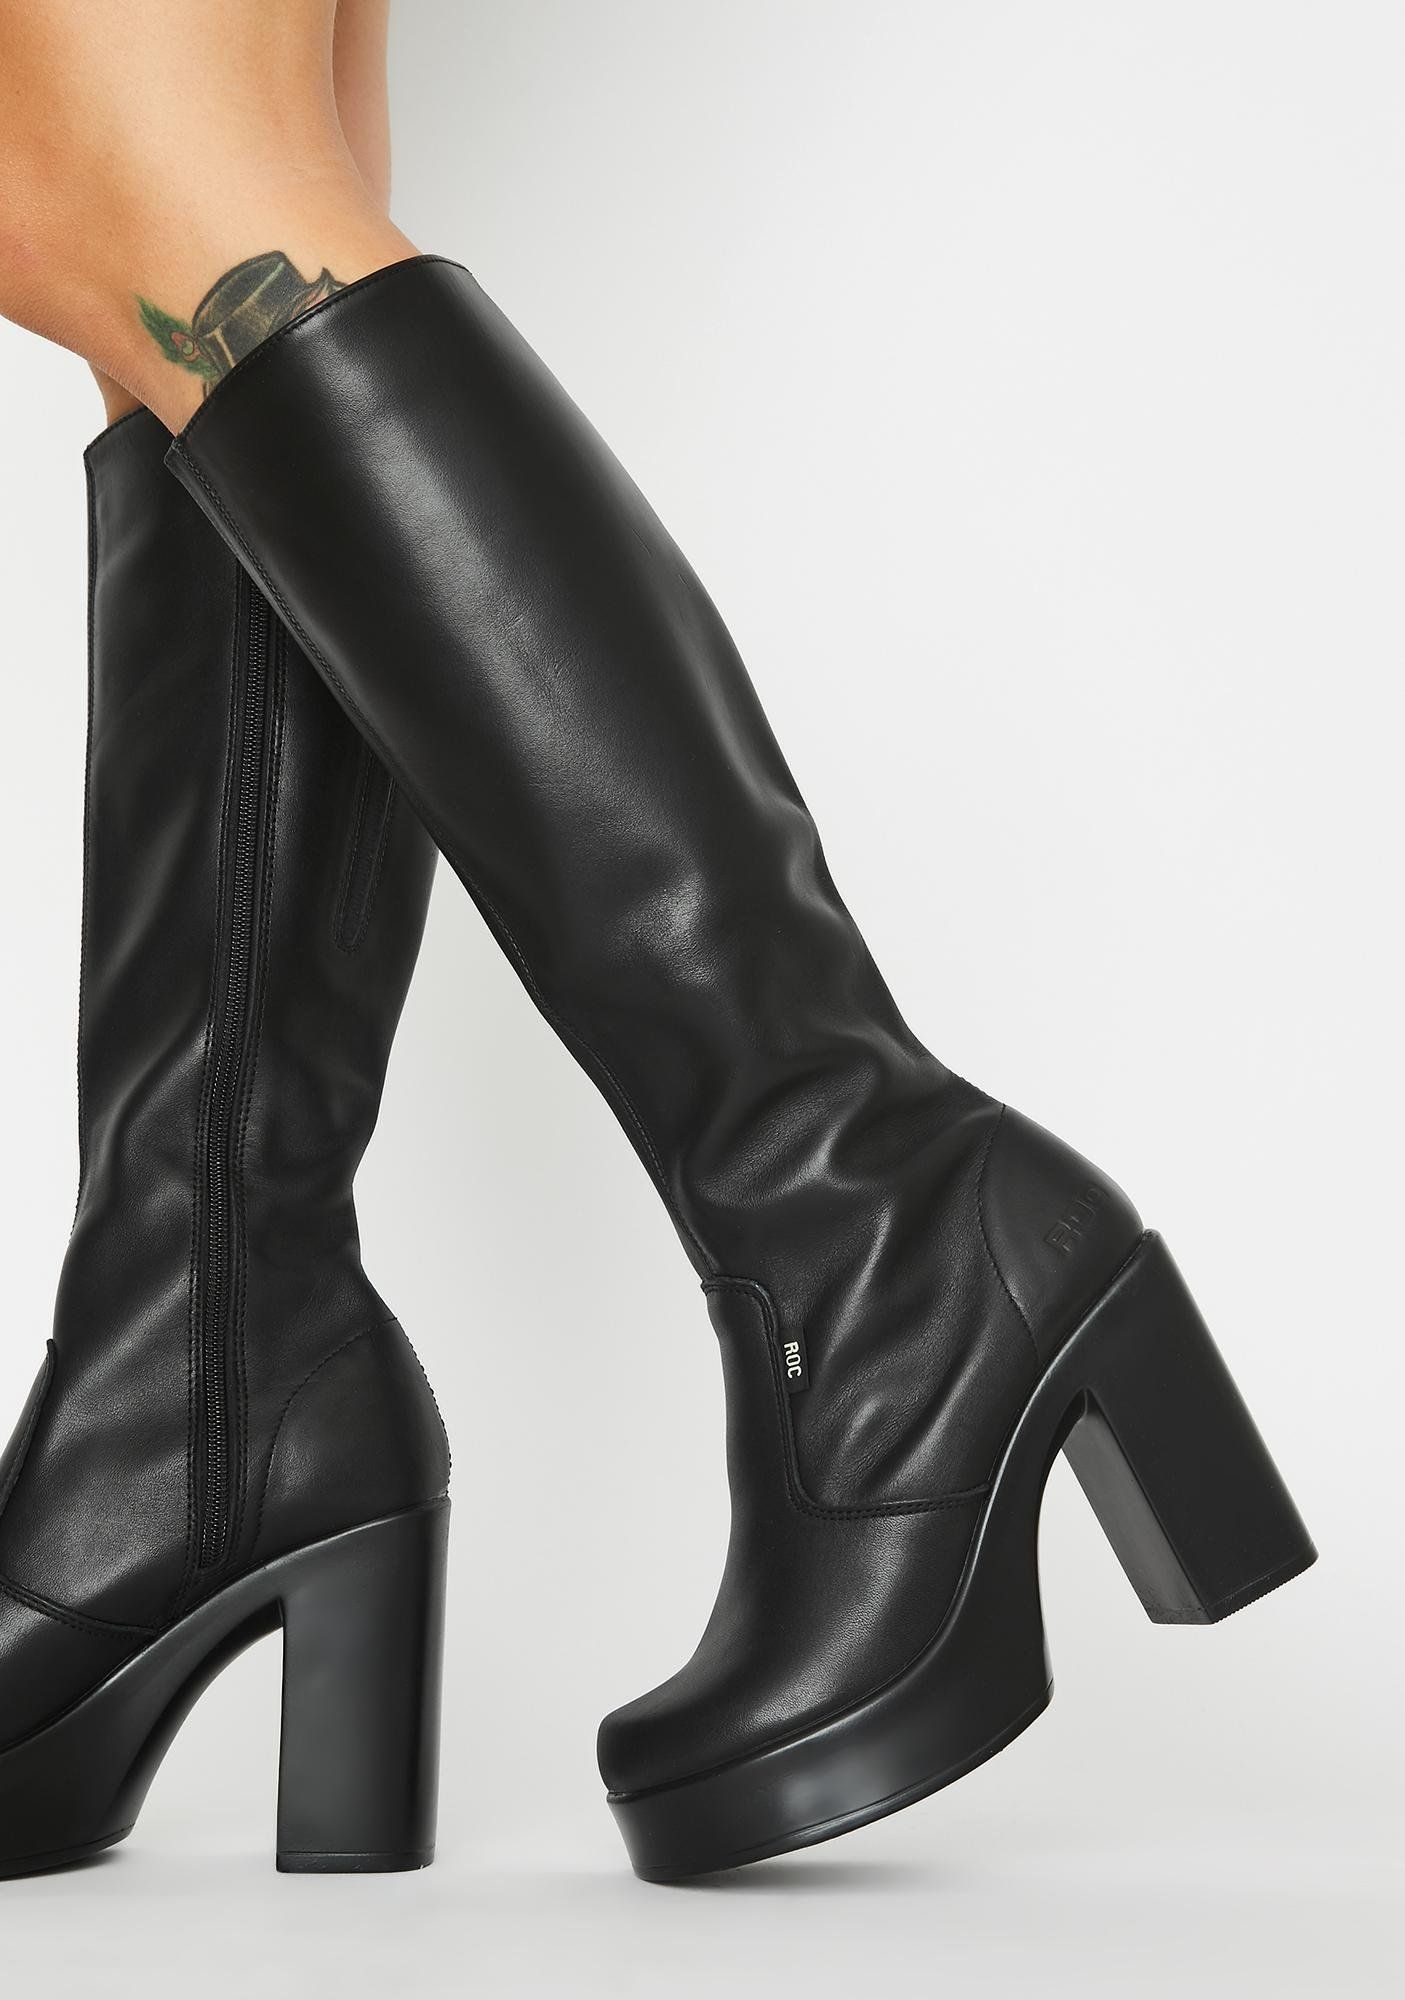 Nebraska Knee High Boots in 2020